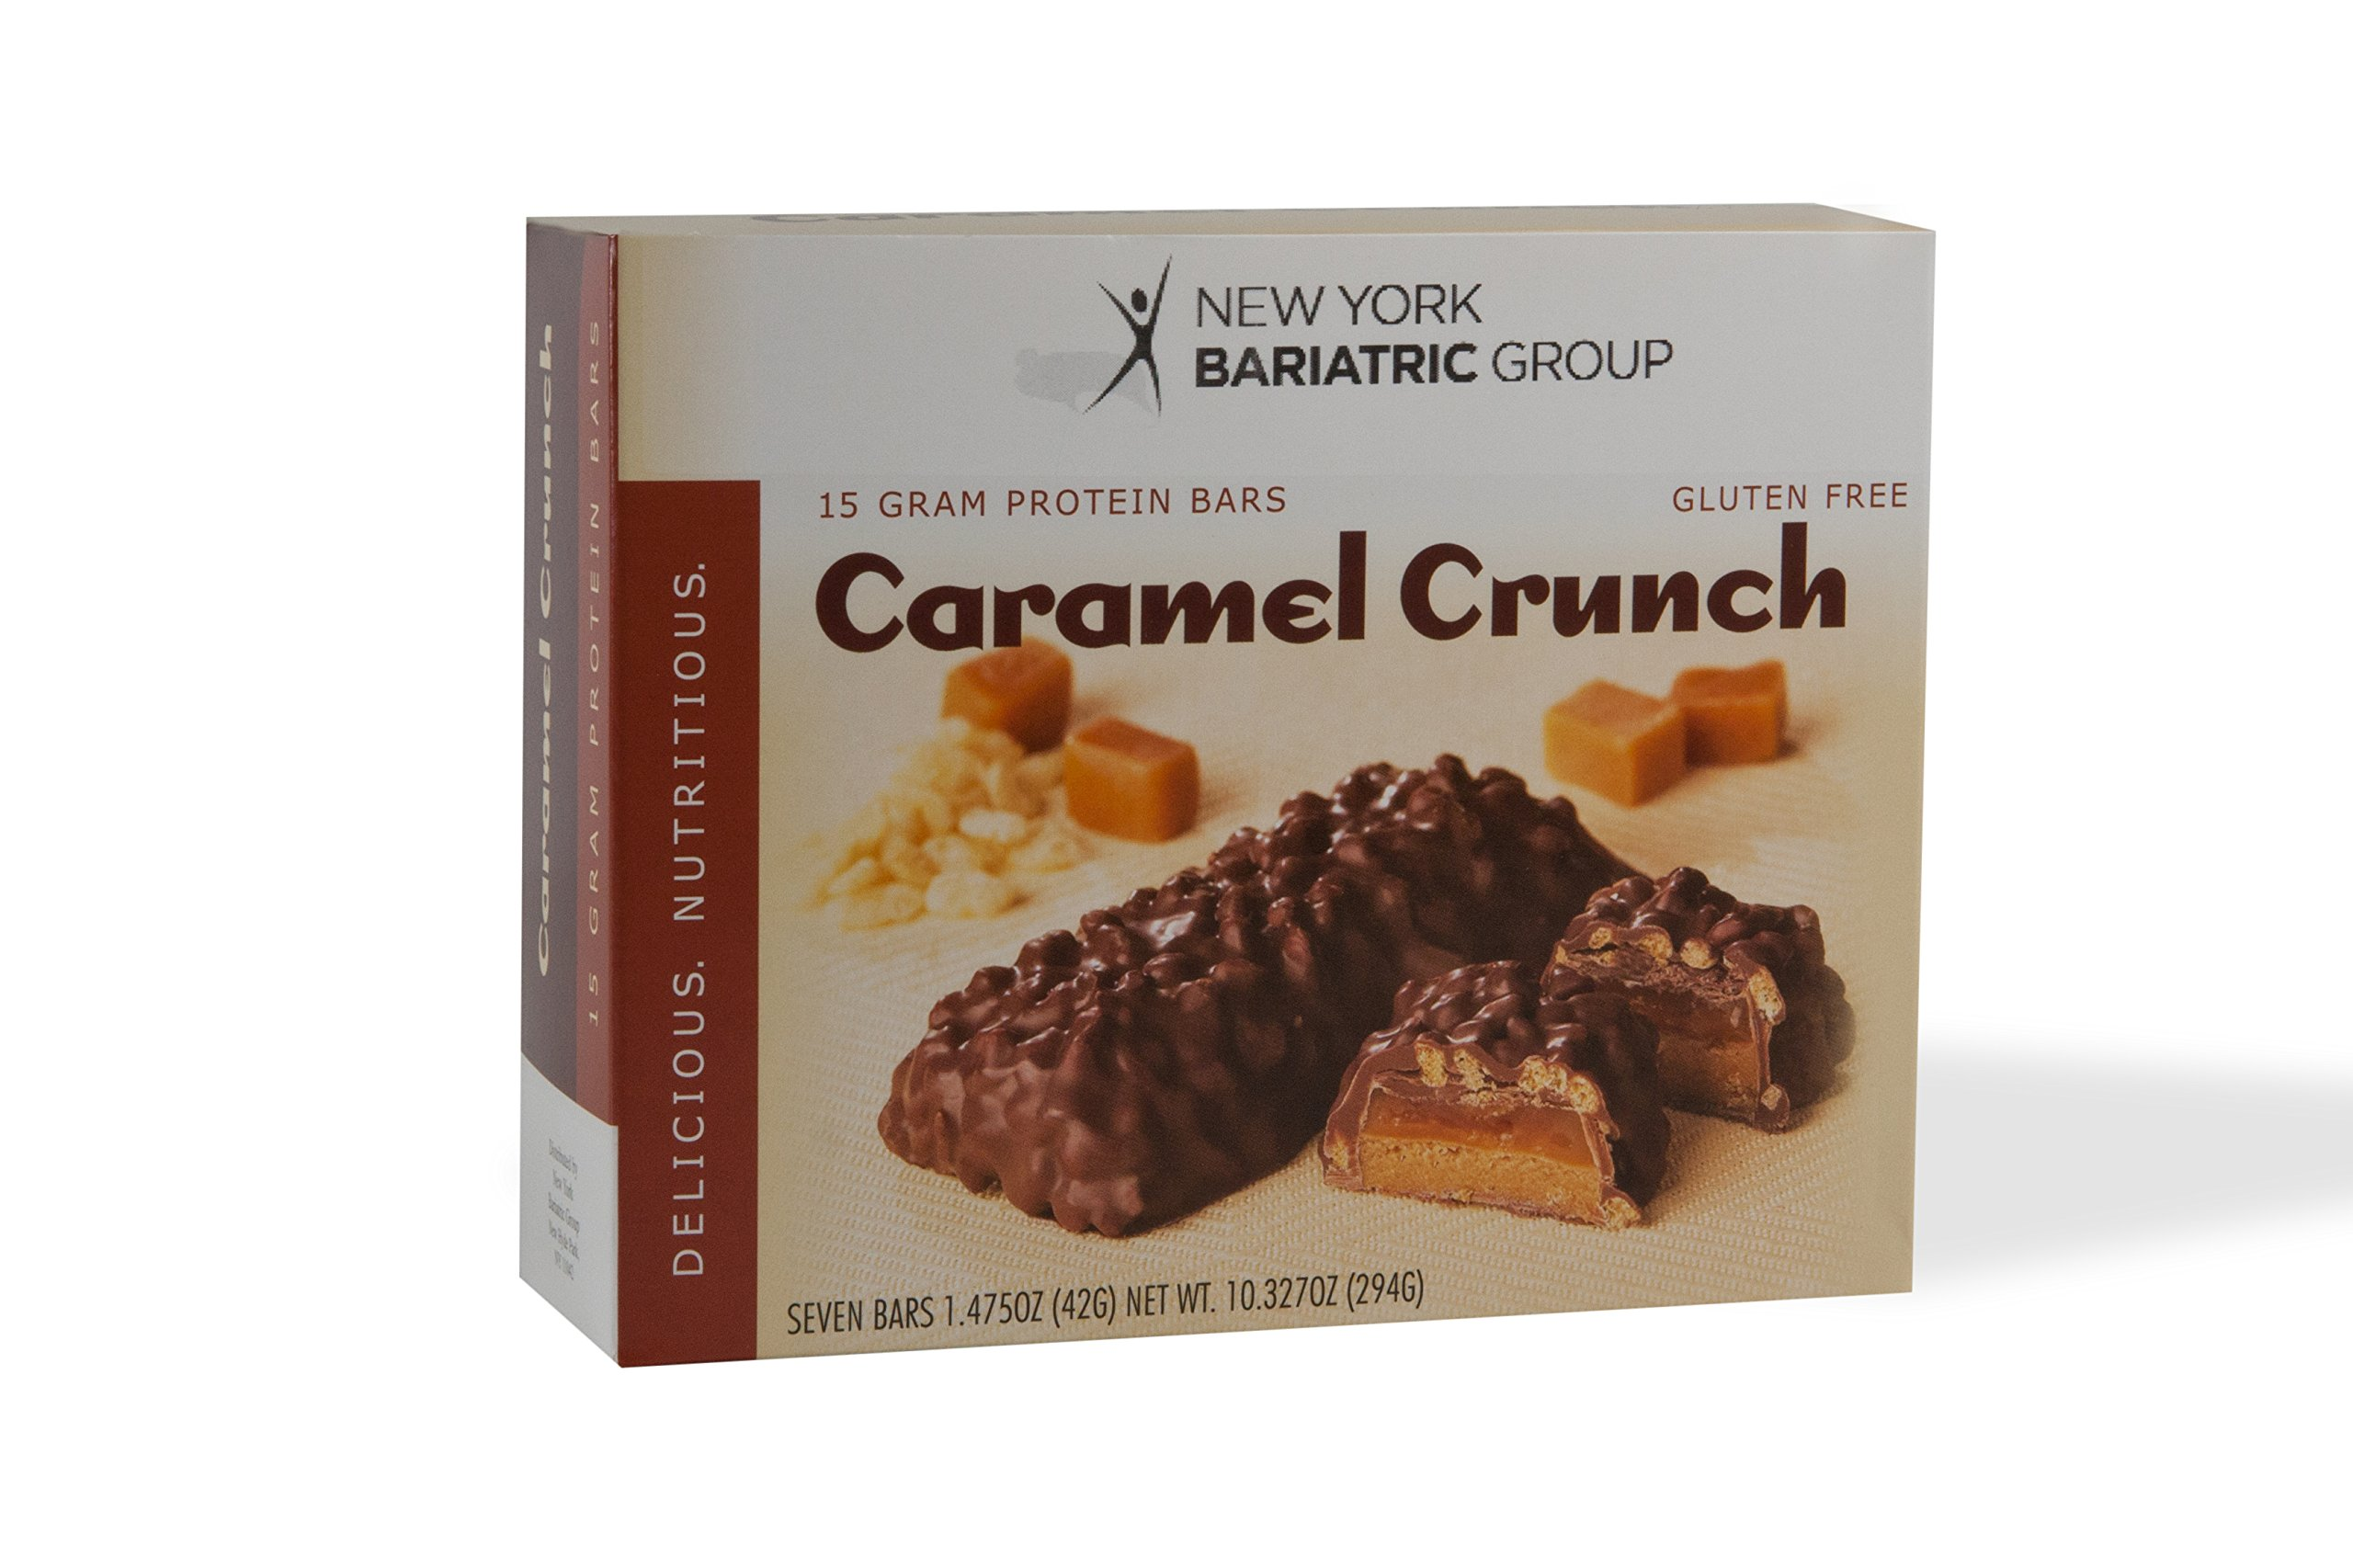 New York Bariatric Group Protein Bars (7 Bars) - Caramel Crunch Protein Bar